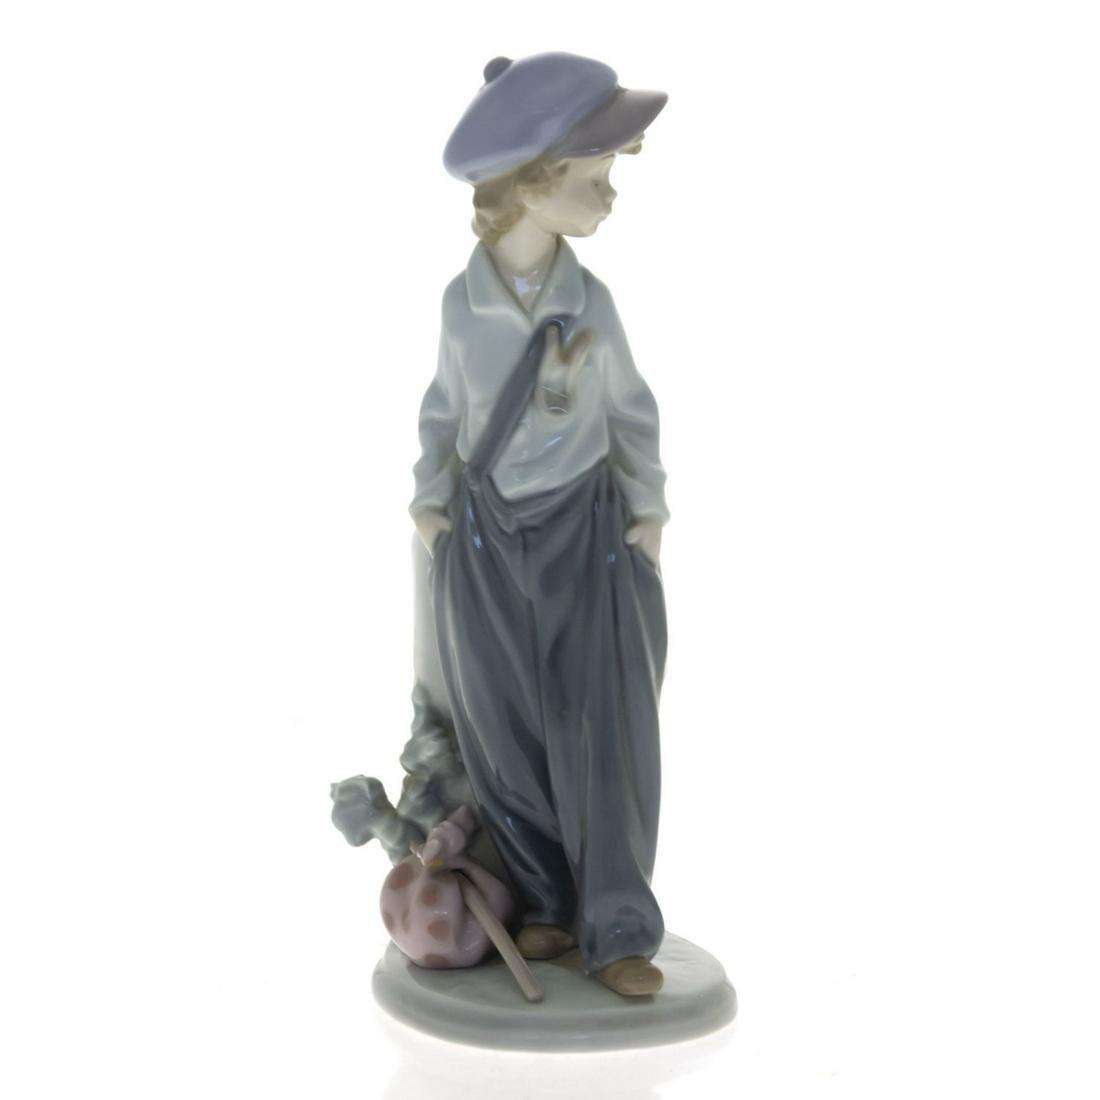 Lladro Porcelain Figure - The Wanderer.